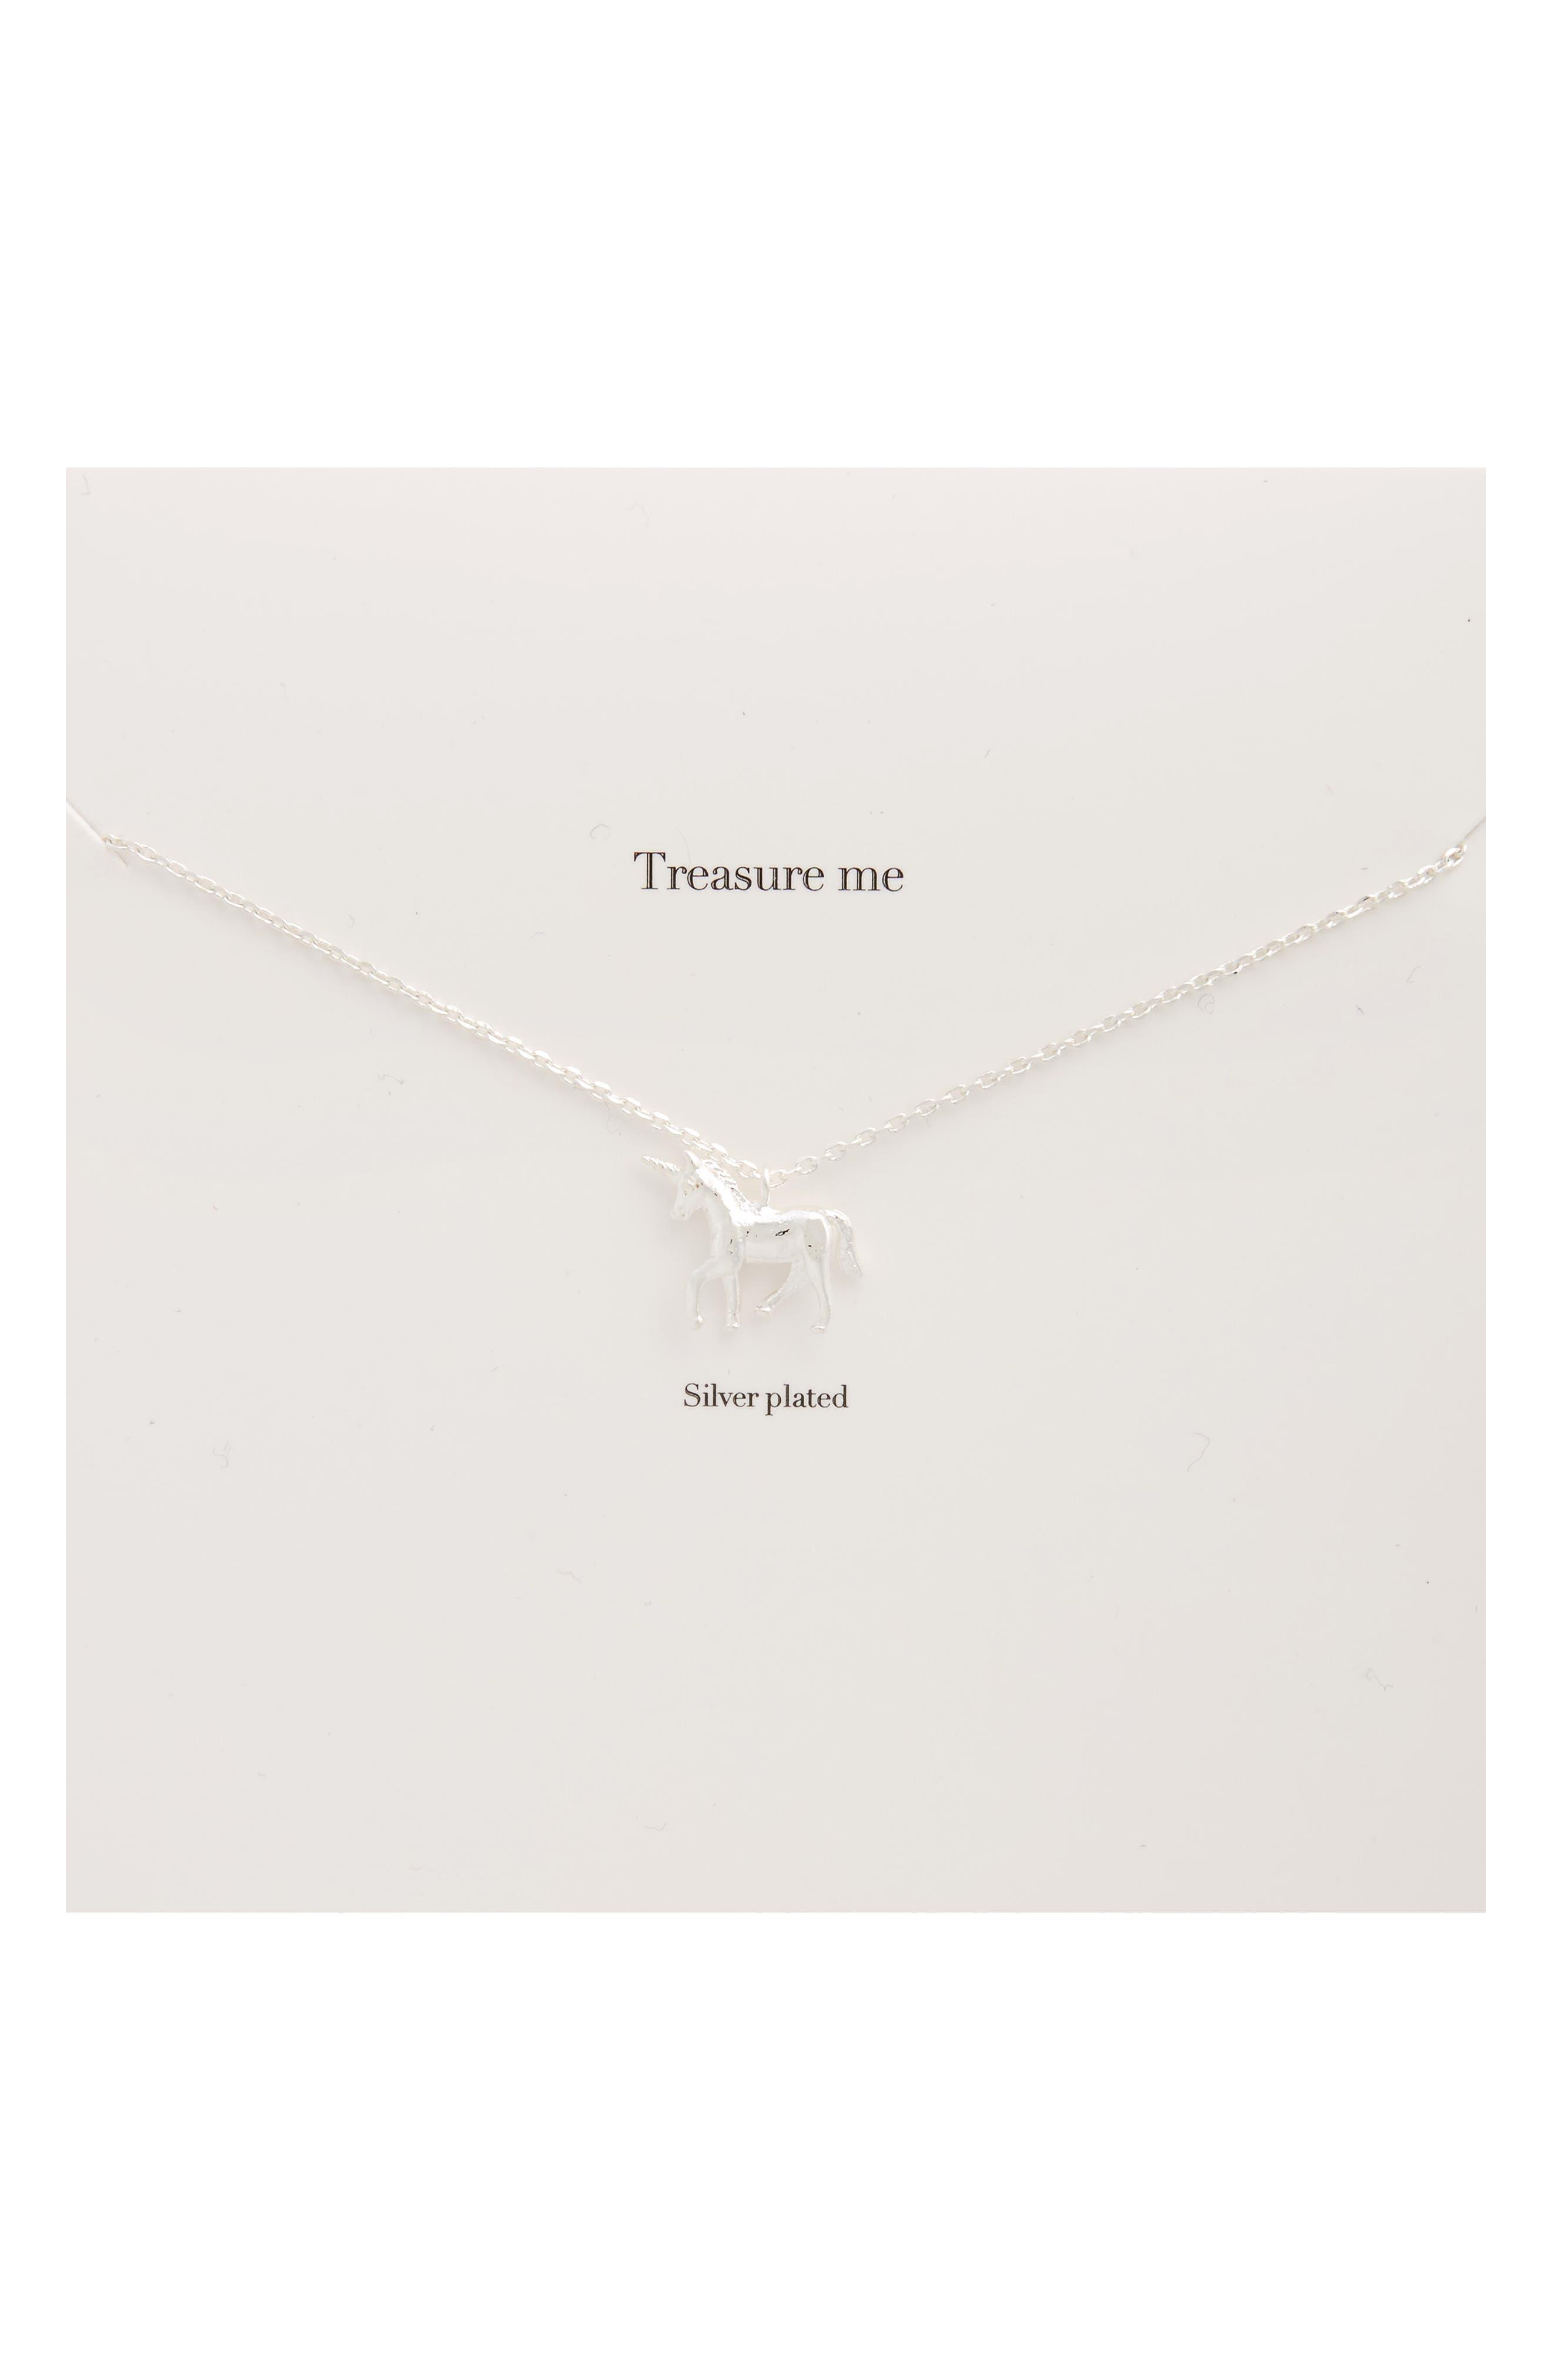 Alternate Image 1 Selected - Estella Bartlett Treasure Me Unicorn Necklace